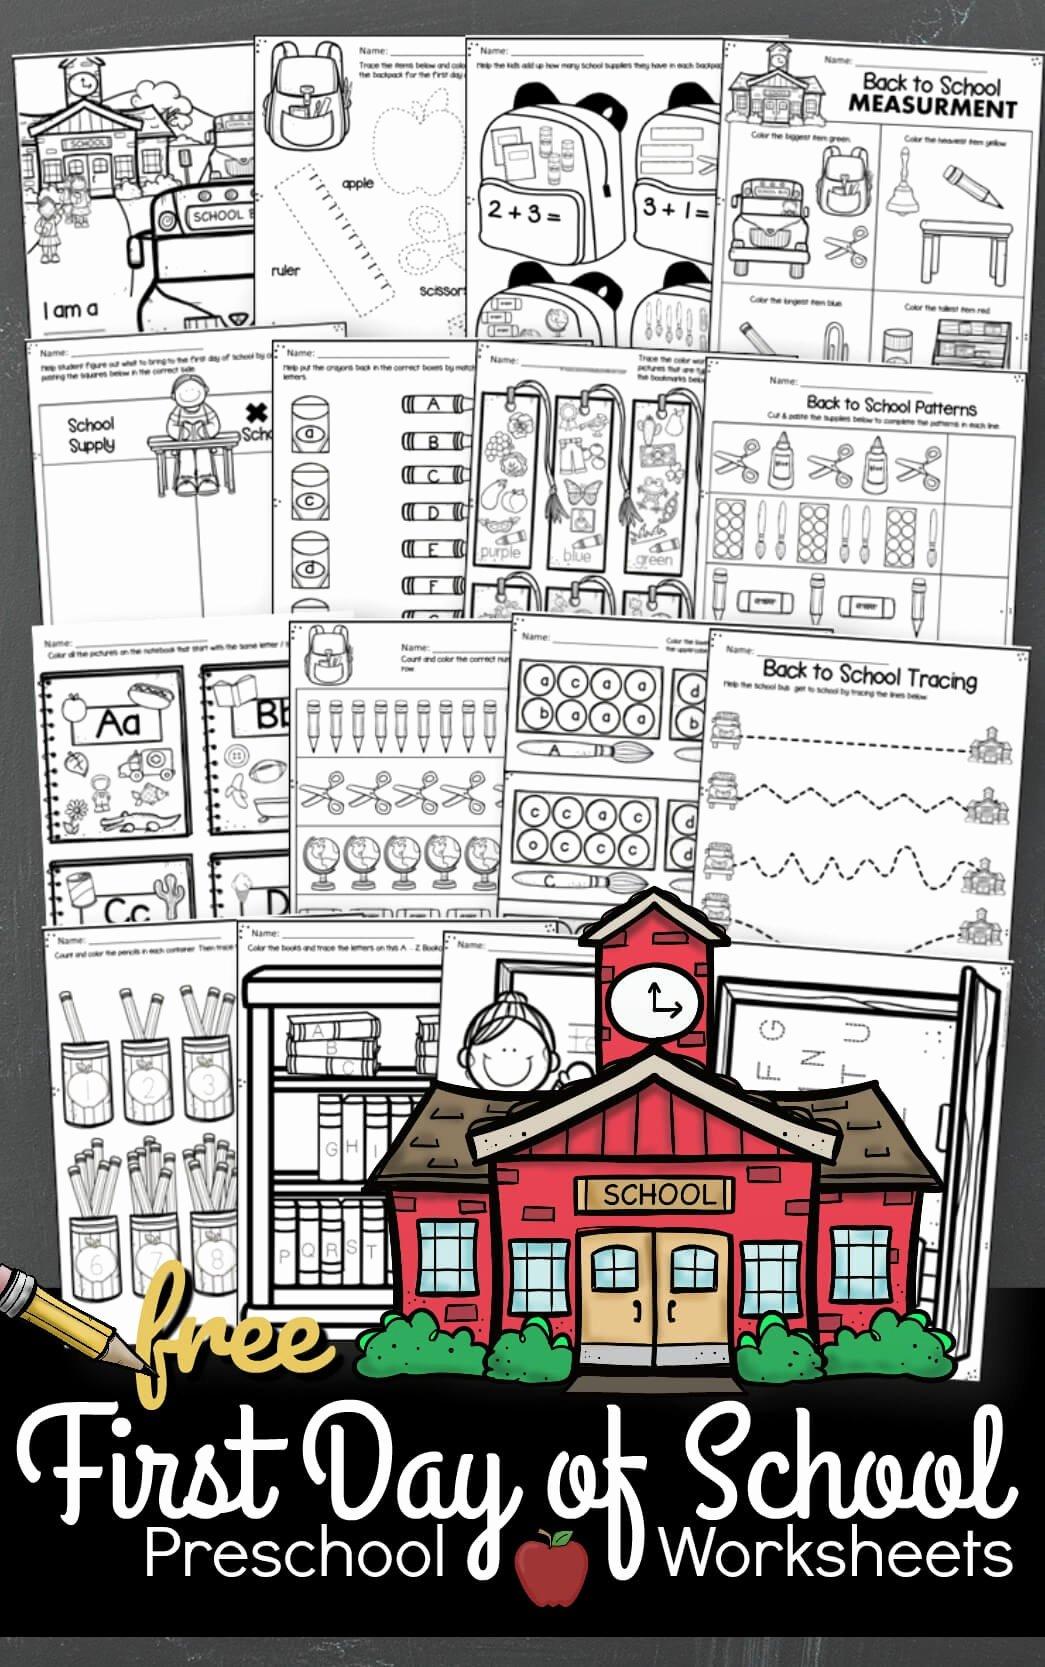 Back to School Worksheets for Preschoolers Best Of Free Back to School Worksheets